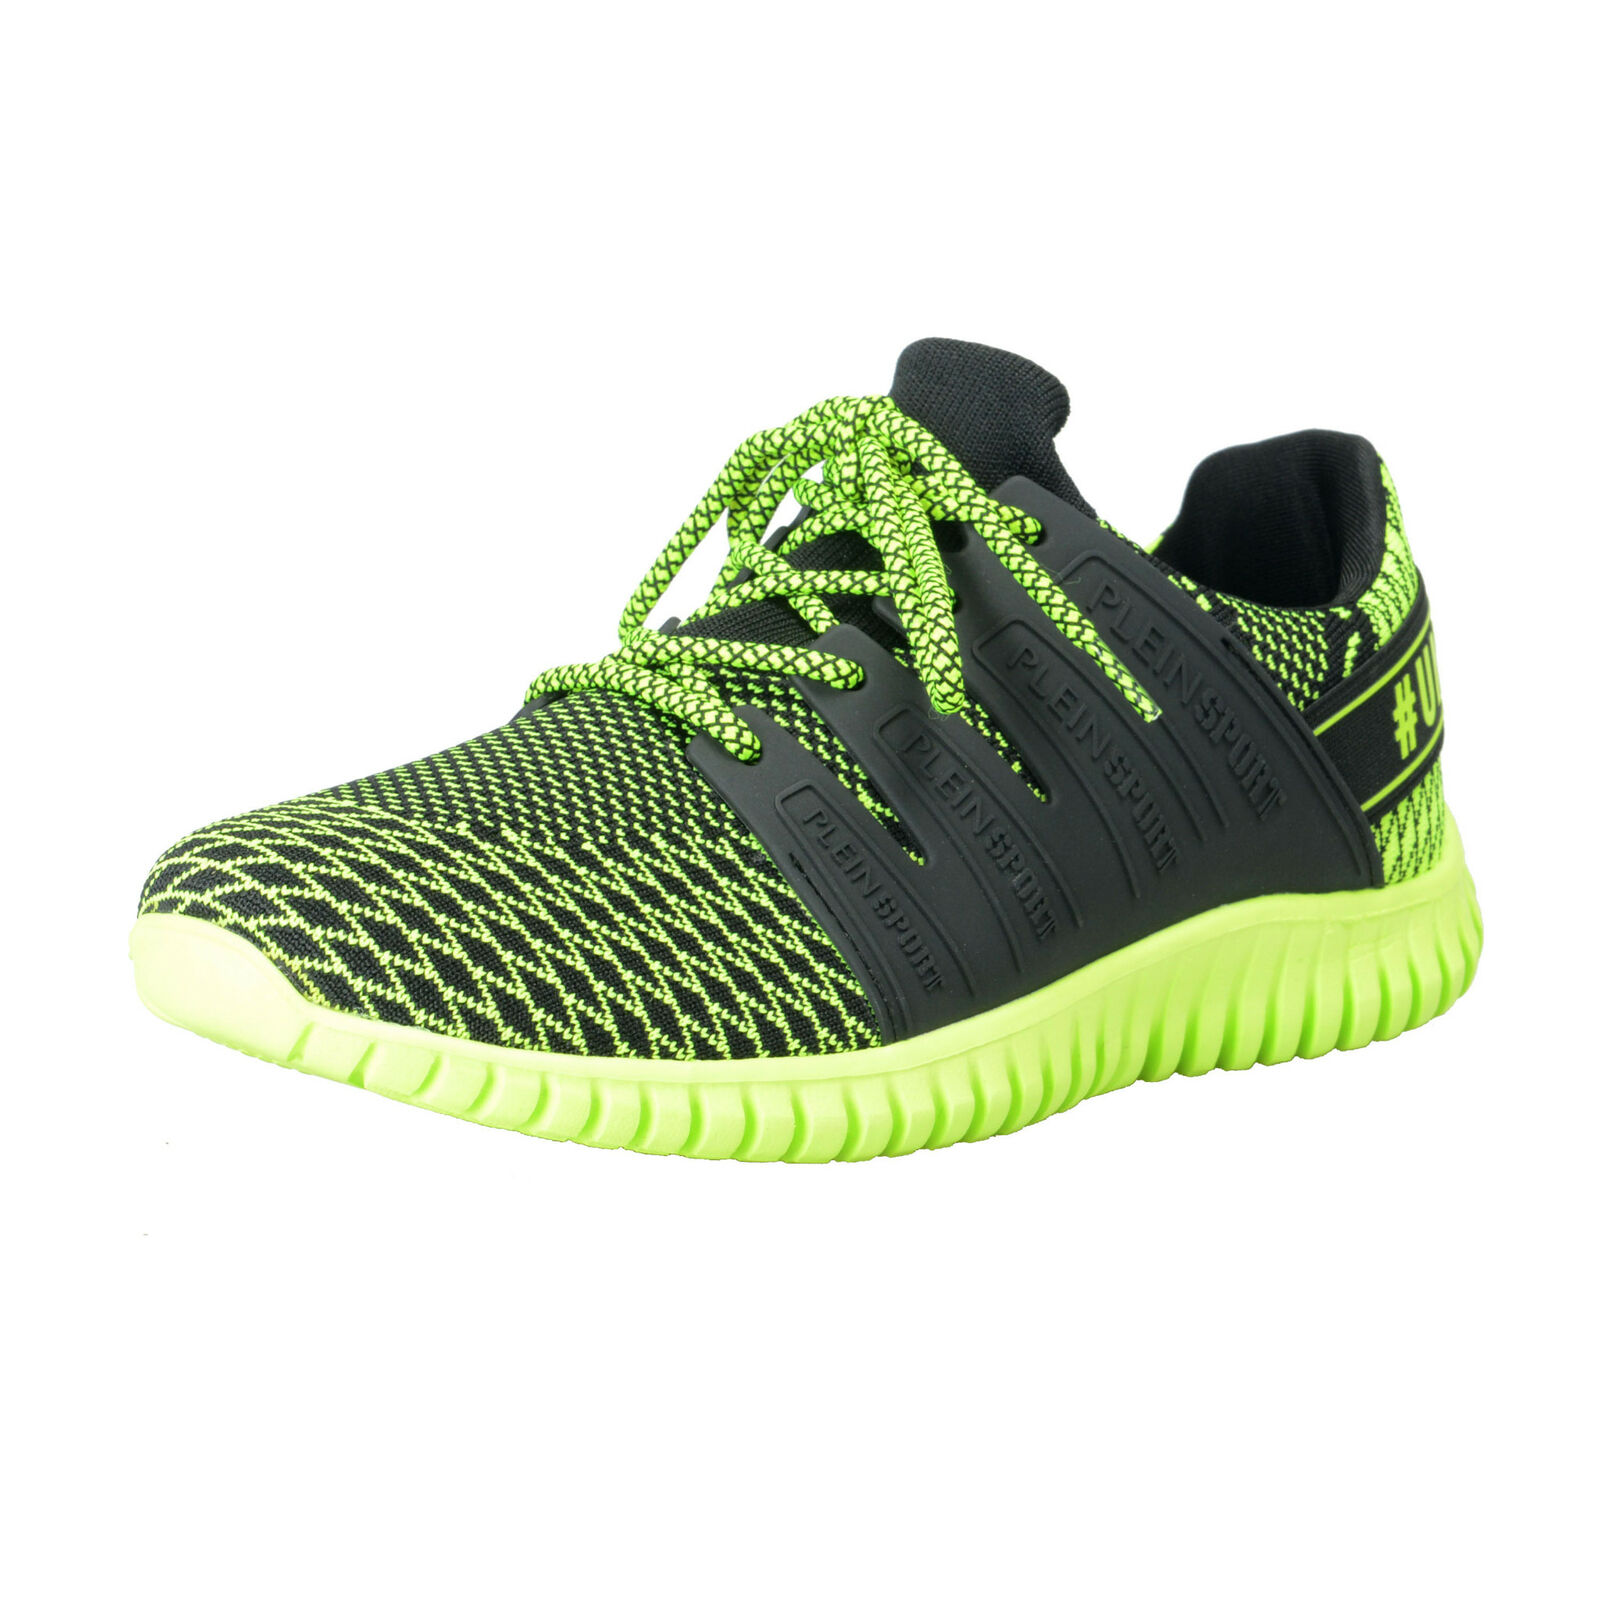 Plein Sport  Mason  Yellow Runner Fashion Sneakers shoes Sz 8 8.5 10 11